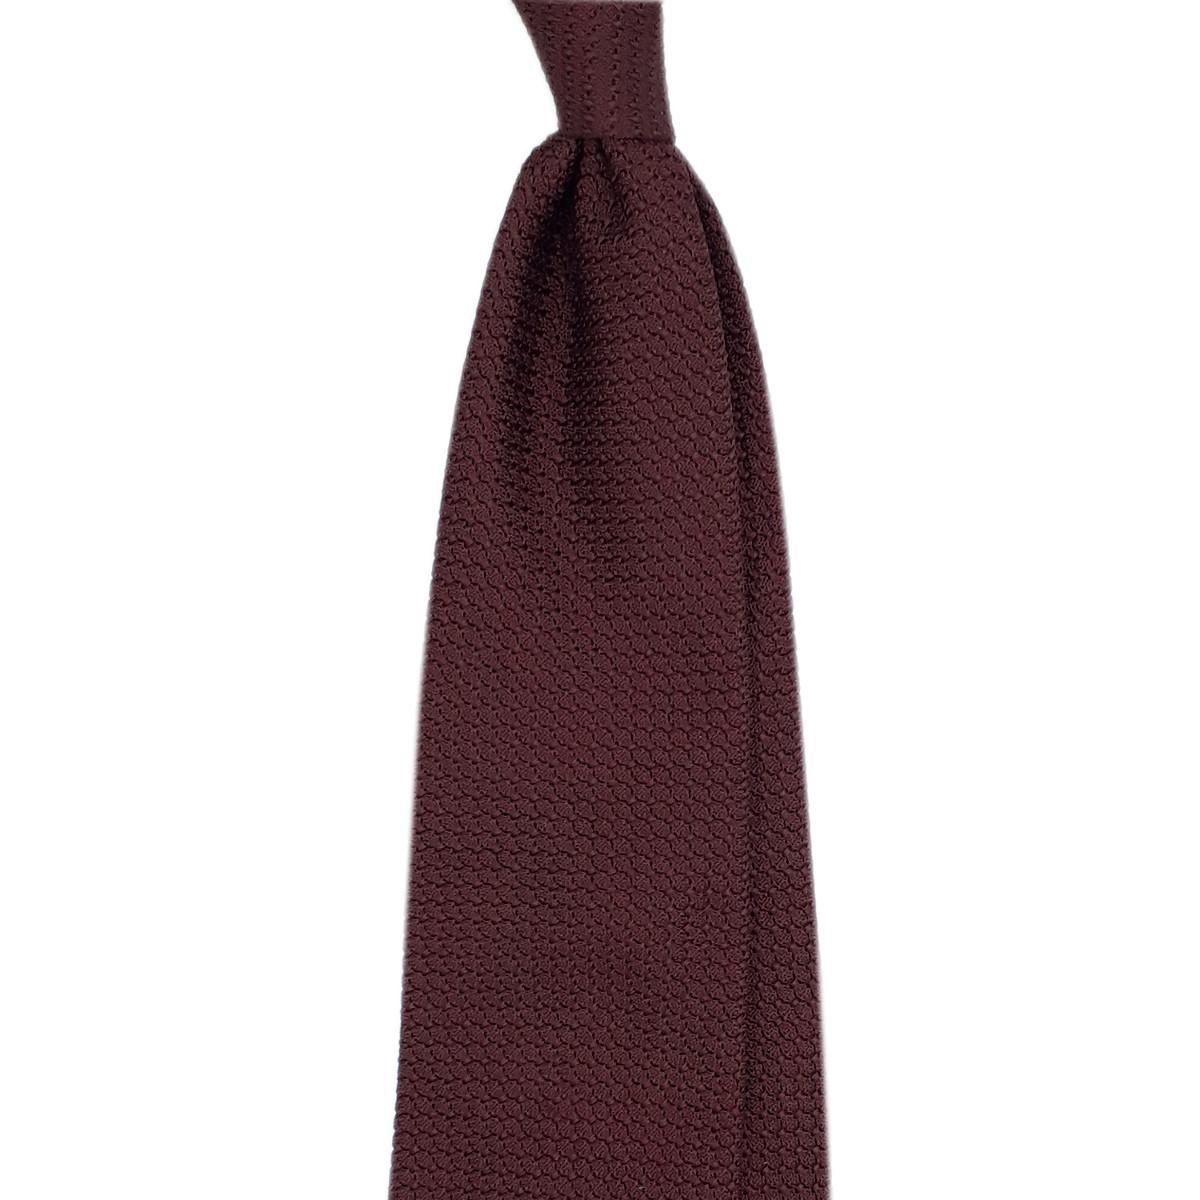 Cravatta Burgundy garza grossa